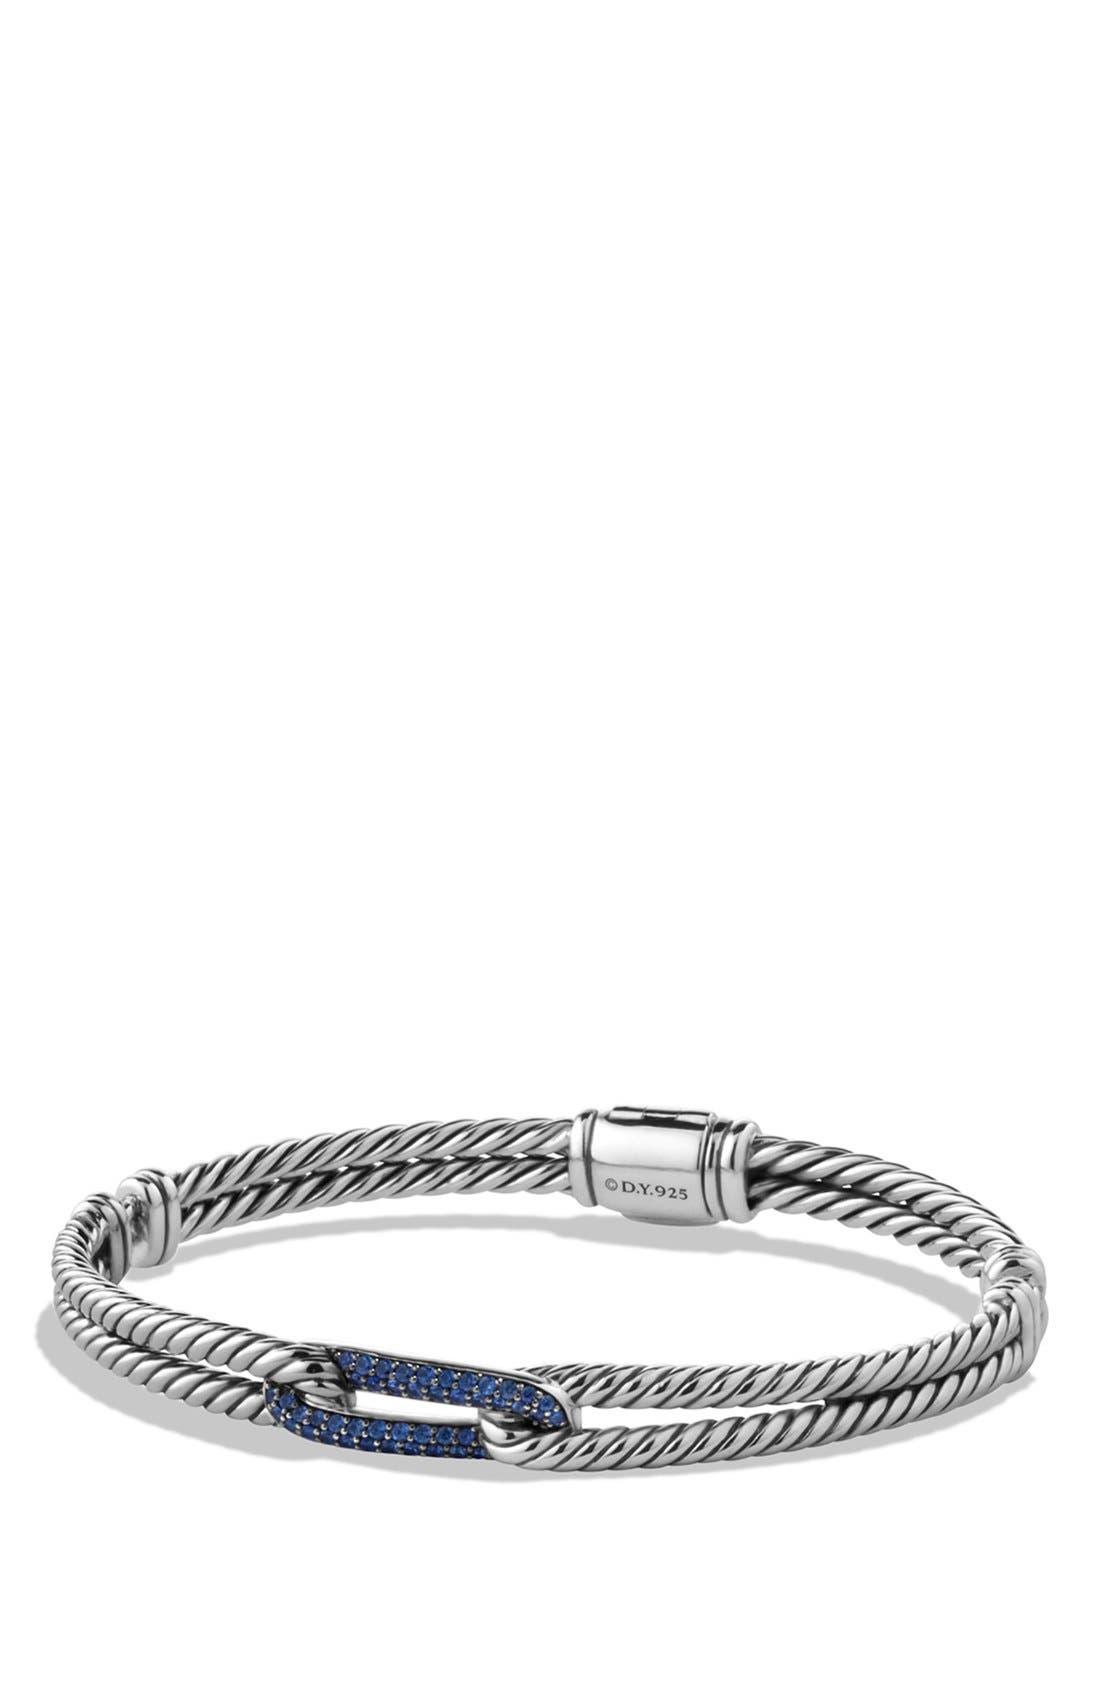 DAVID YURMAN 'Labyrinth' Petite Pavé Single-Loop Bracelet with Sapphires, Main, color, BLUE SAPPHIRE